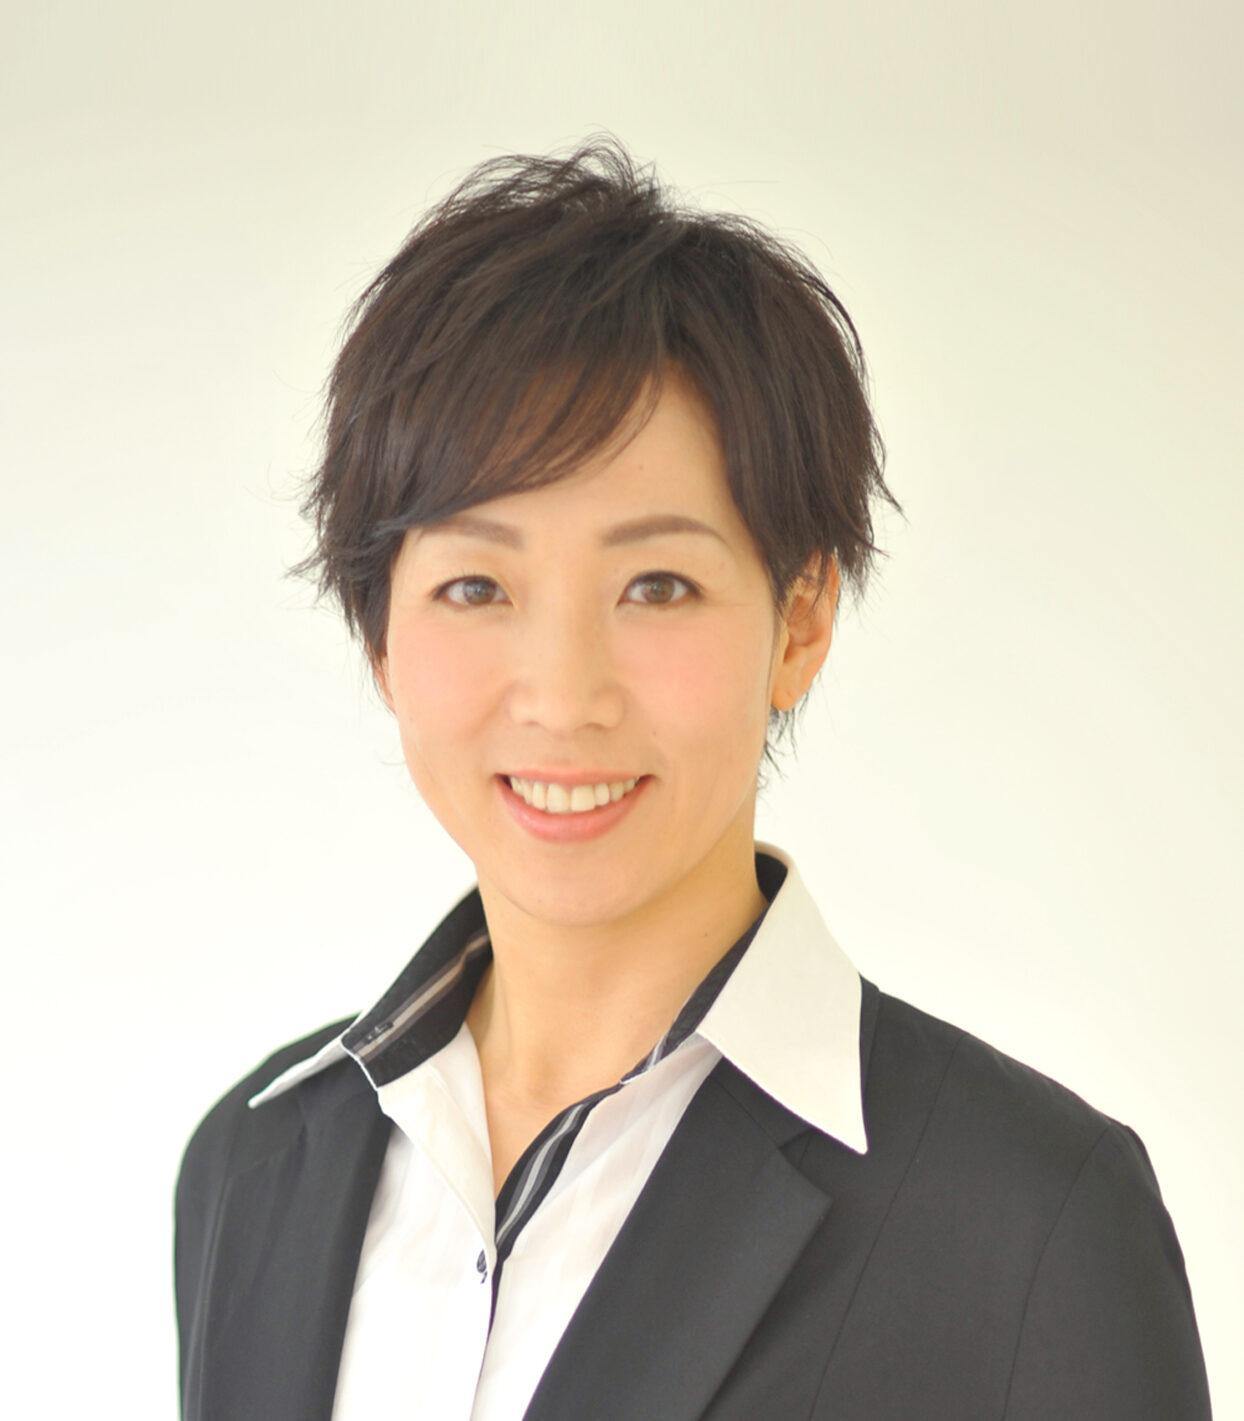 堀川亜希子